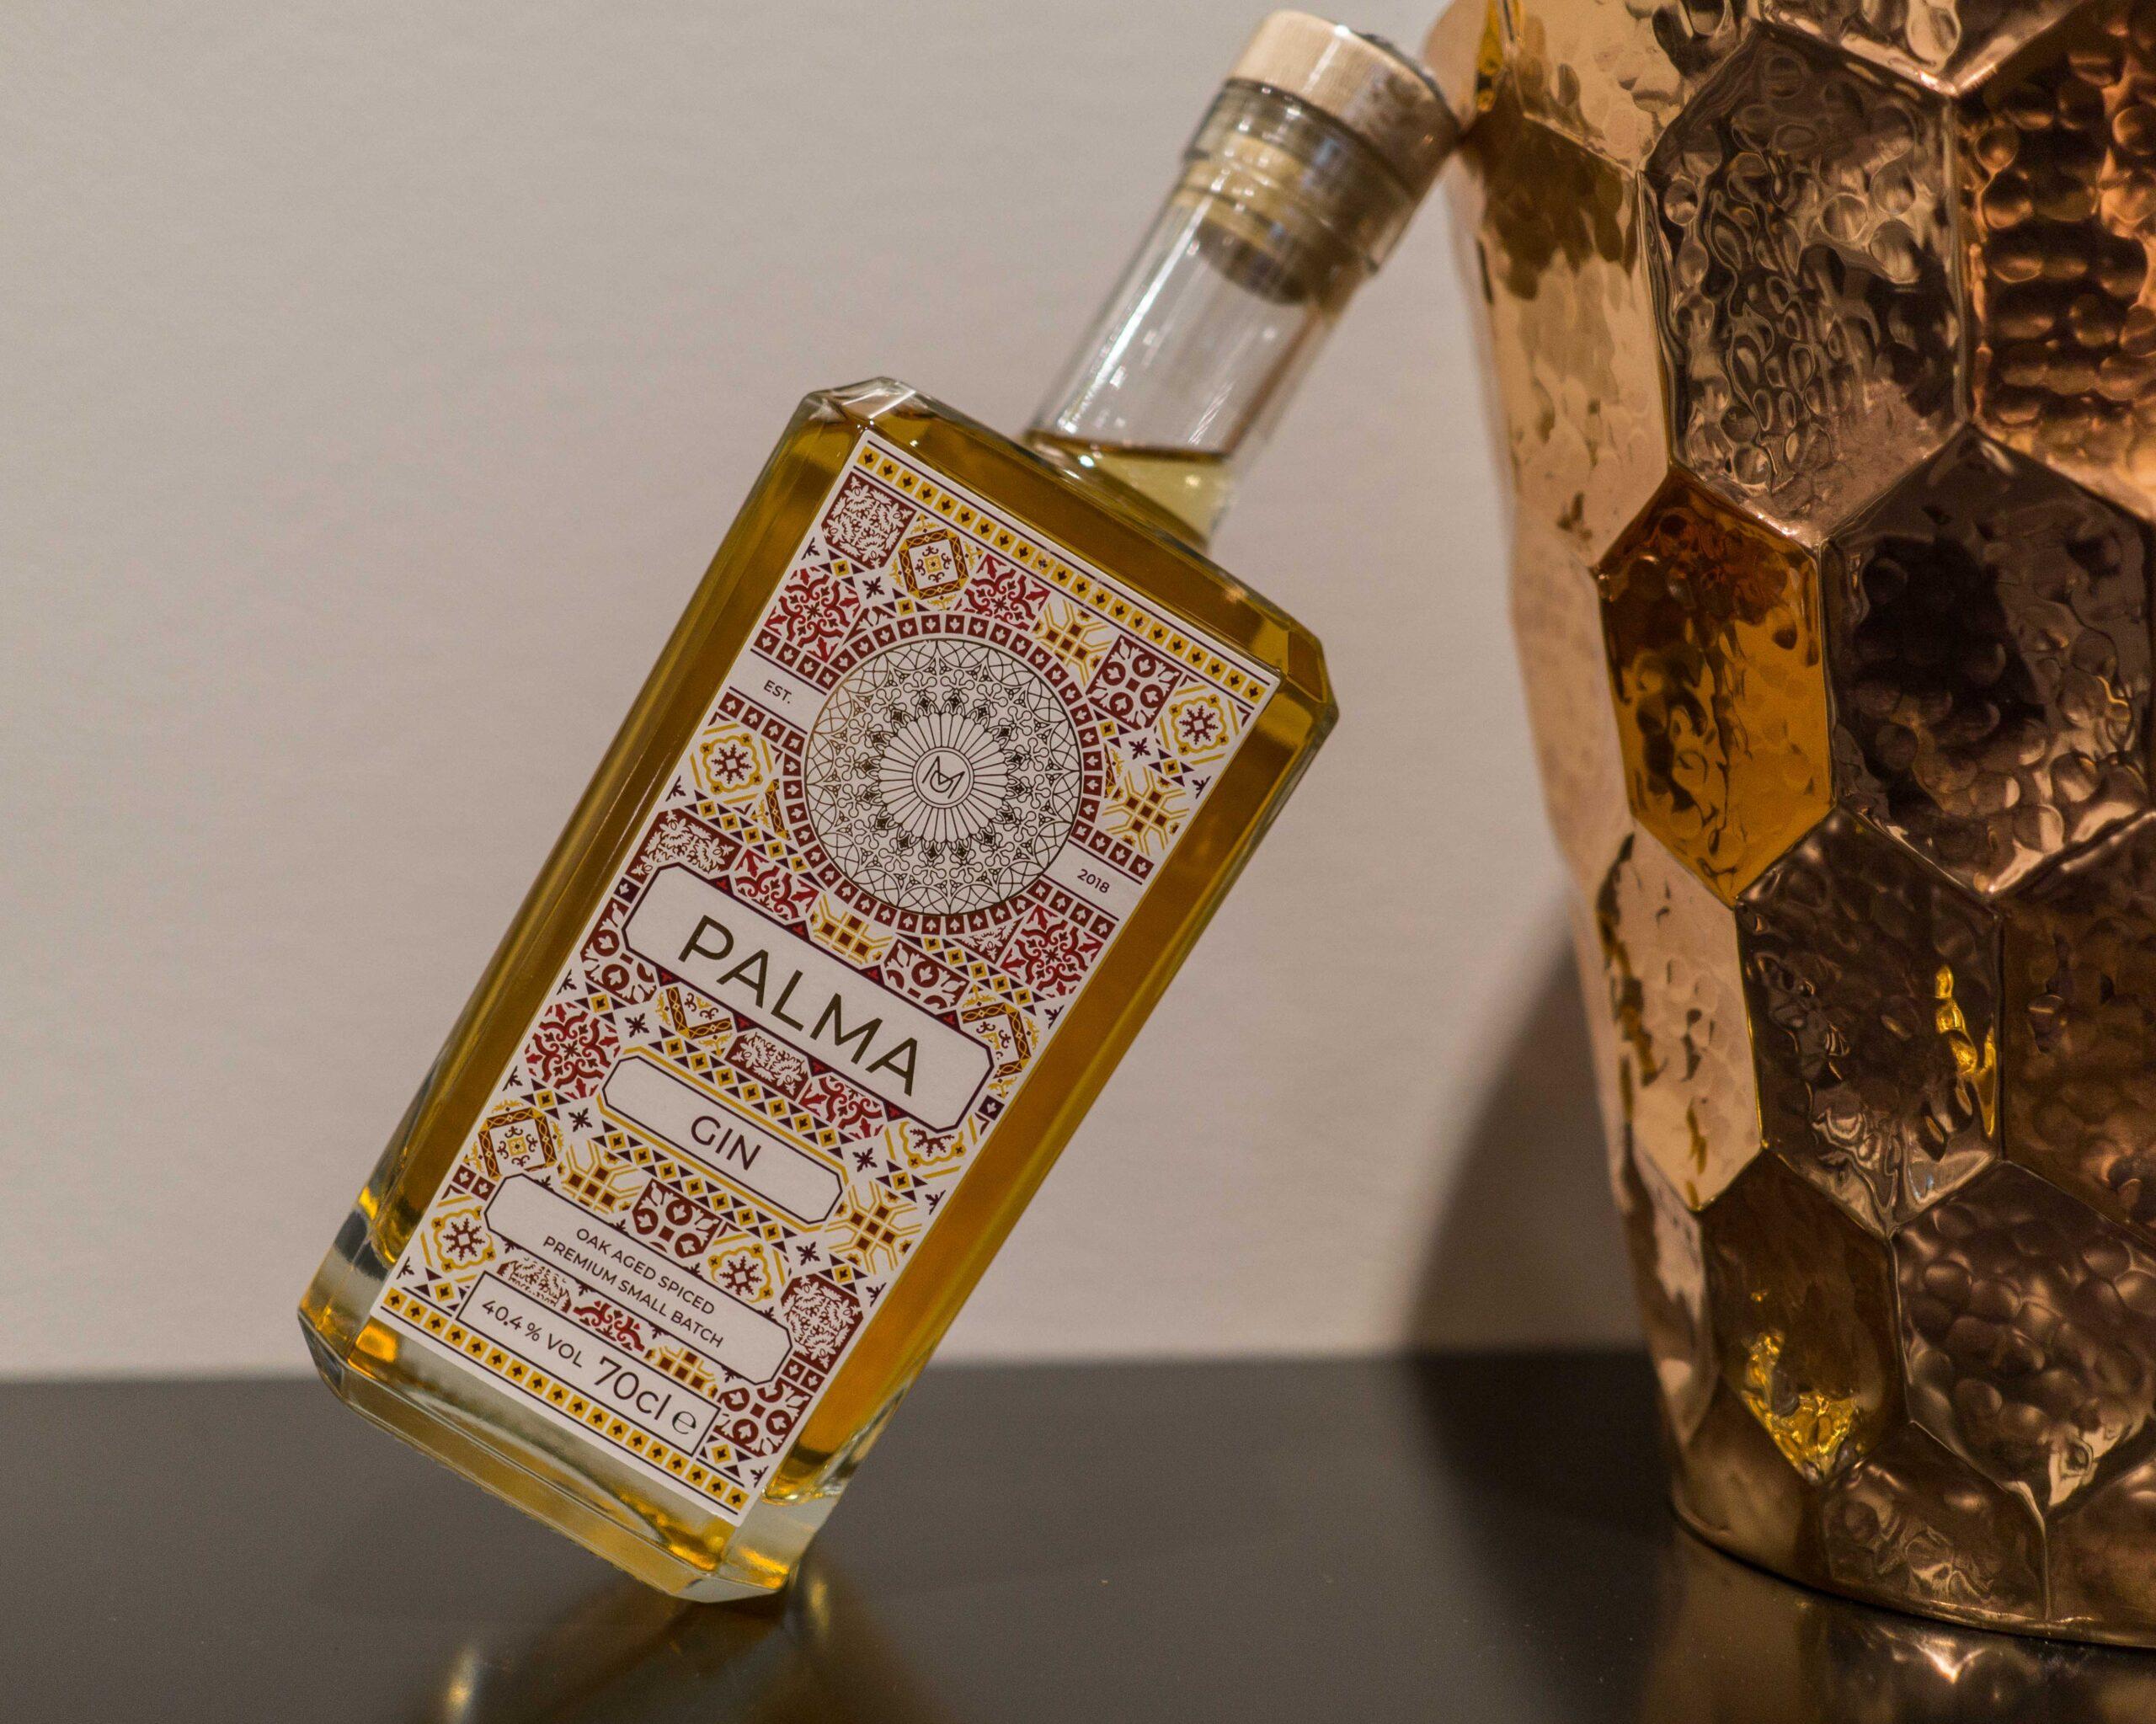 Palma Oak Spiced Gin